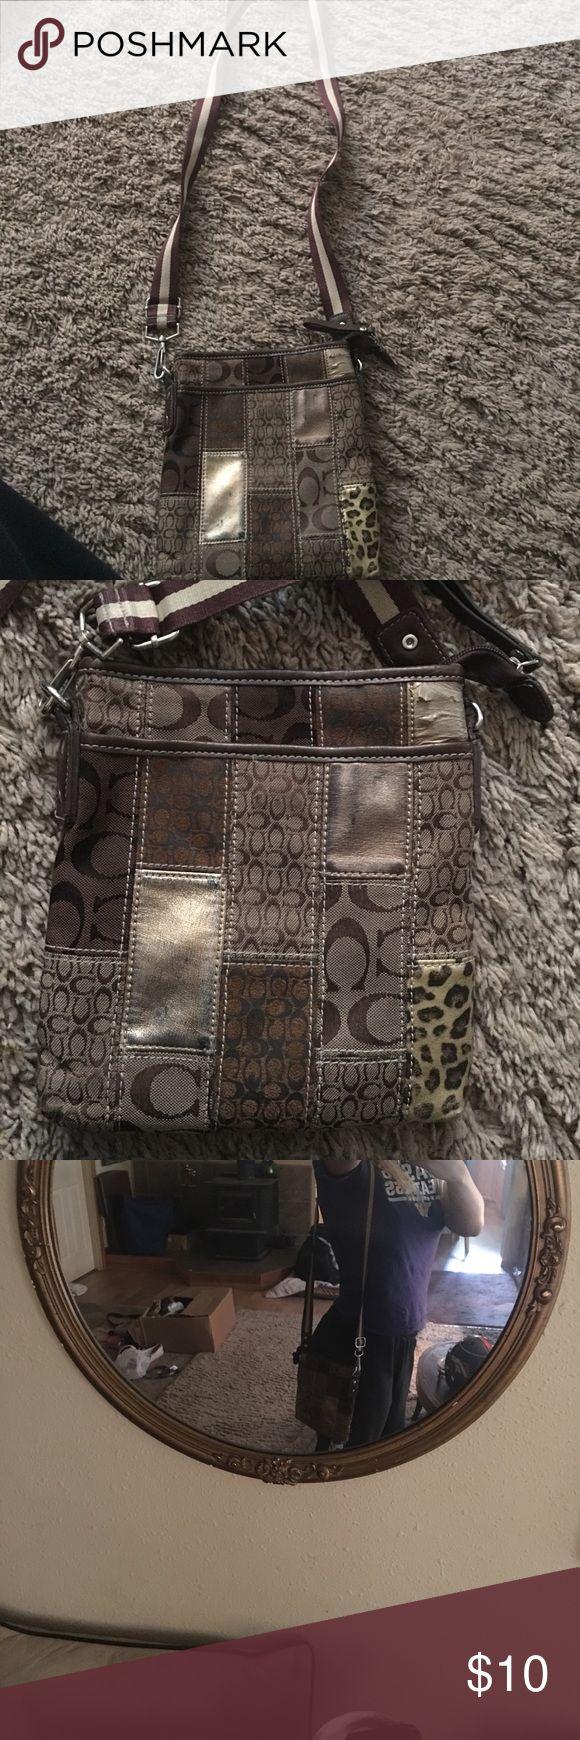 COACH PURSE Little bit worn but it's adjustable and clean :) Coach Bags Shoulder Bags